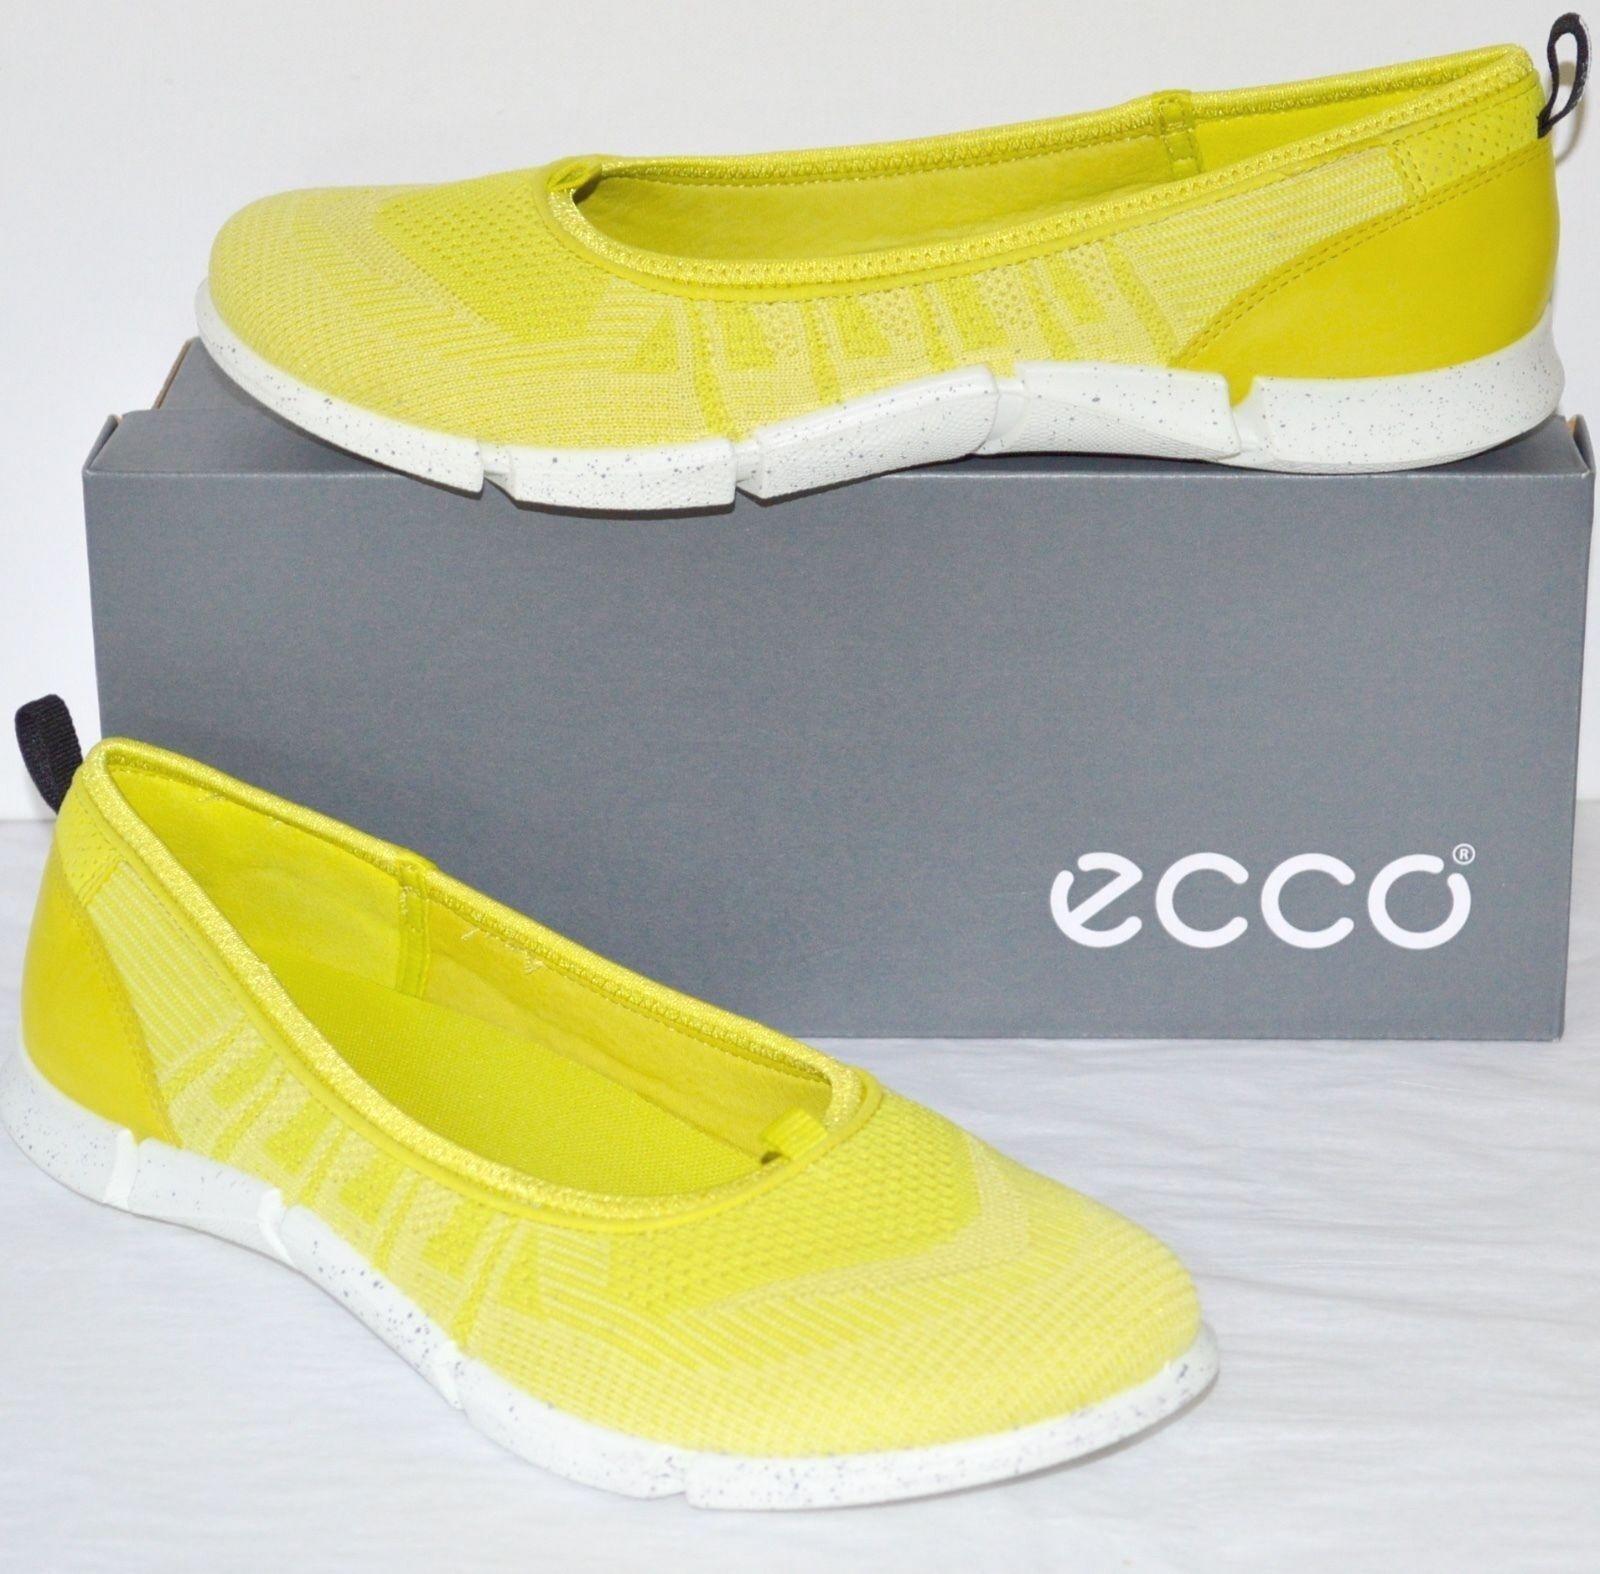 New  135 ECCO Intrinsic Karma Ballerina Sulphur Lemon Neon 11 Yellow Slip On sz 11 Neon fb89f4